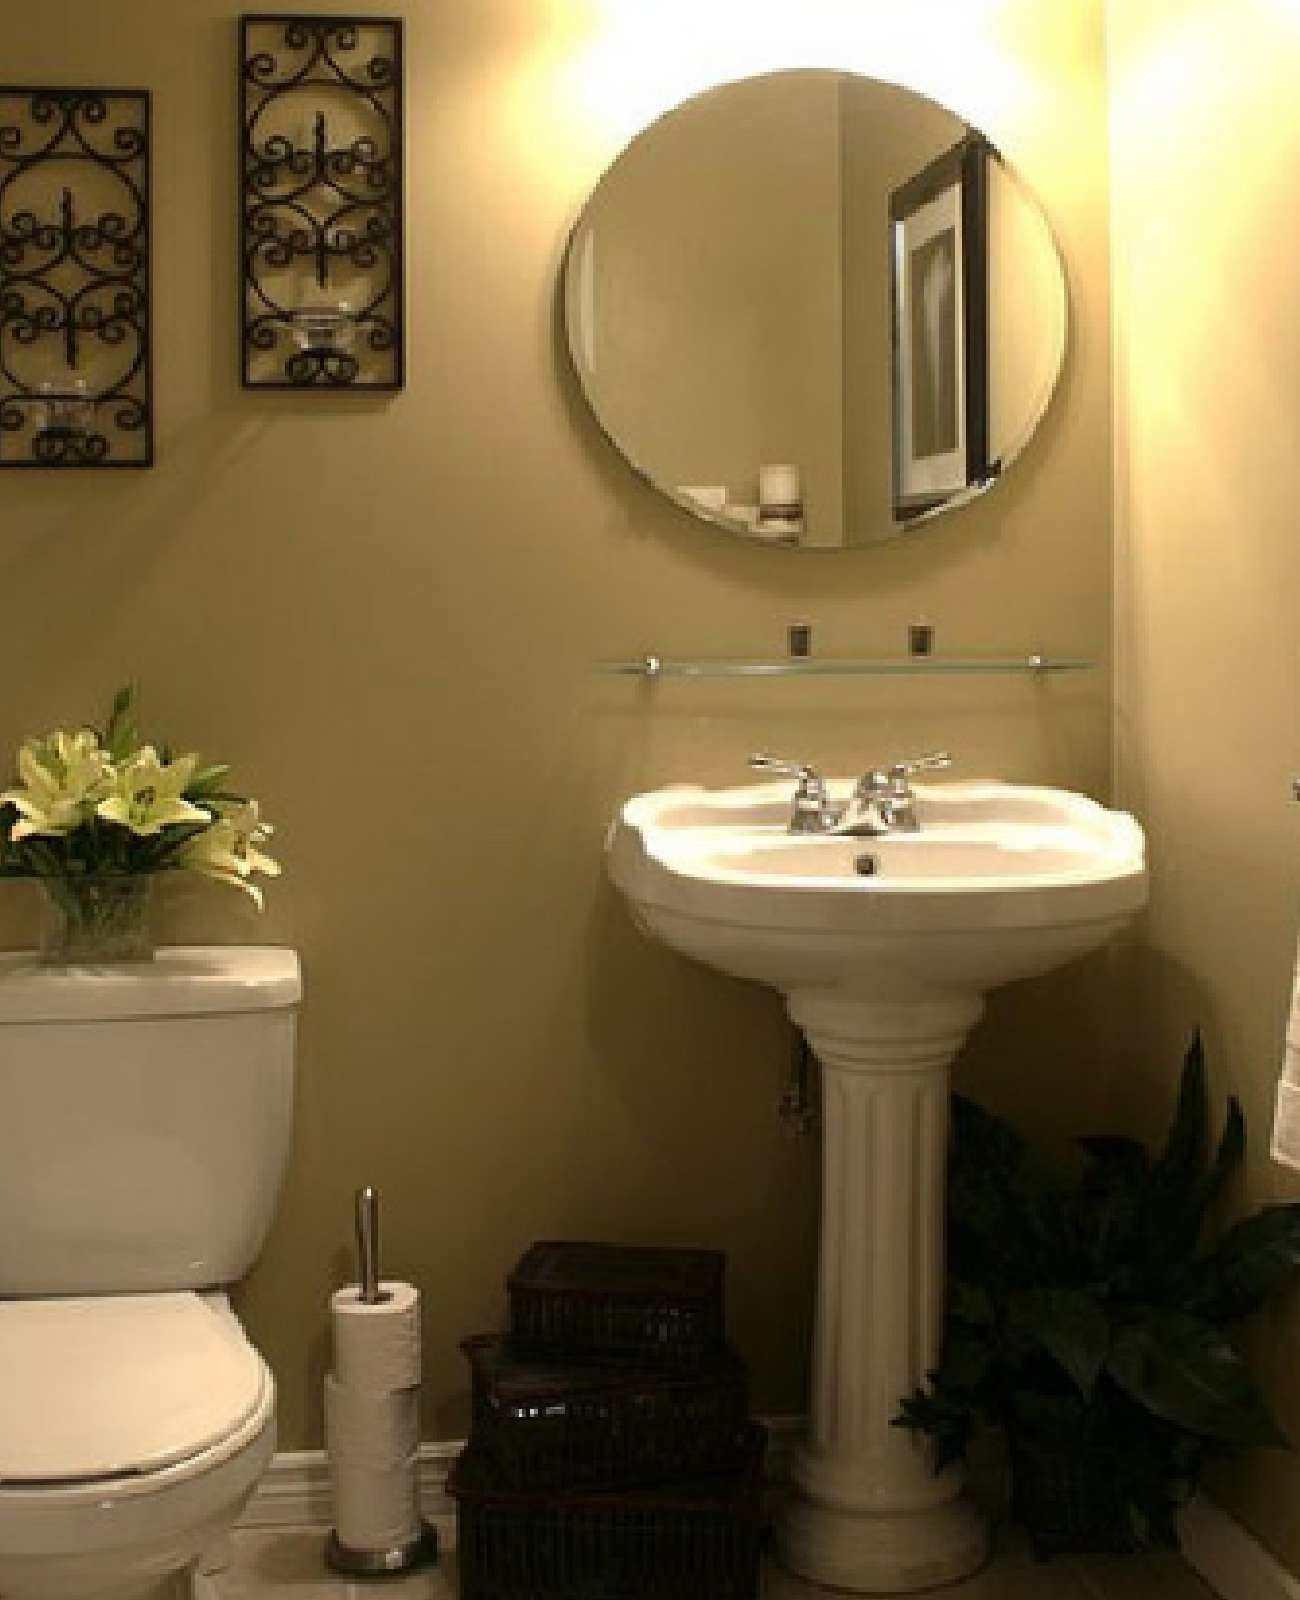 Top 25+ best Small bathroom wallpaper ideas on Pinterest | Half